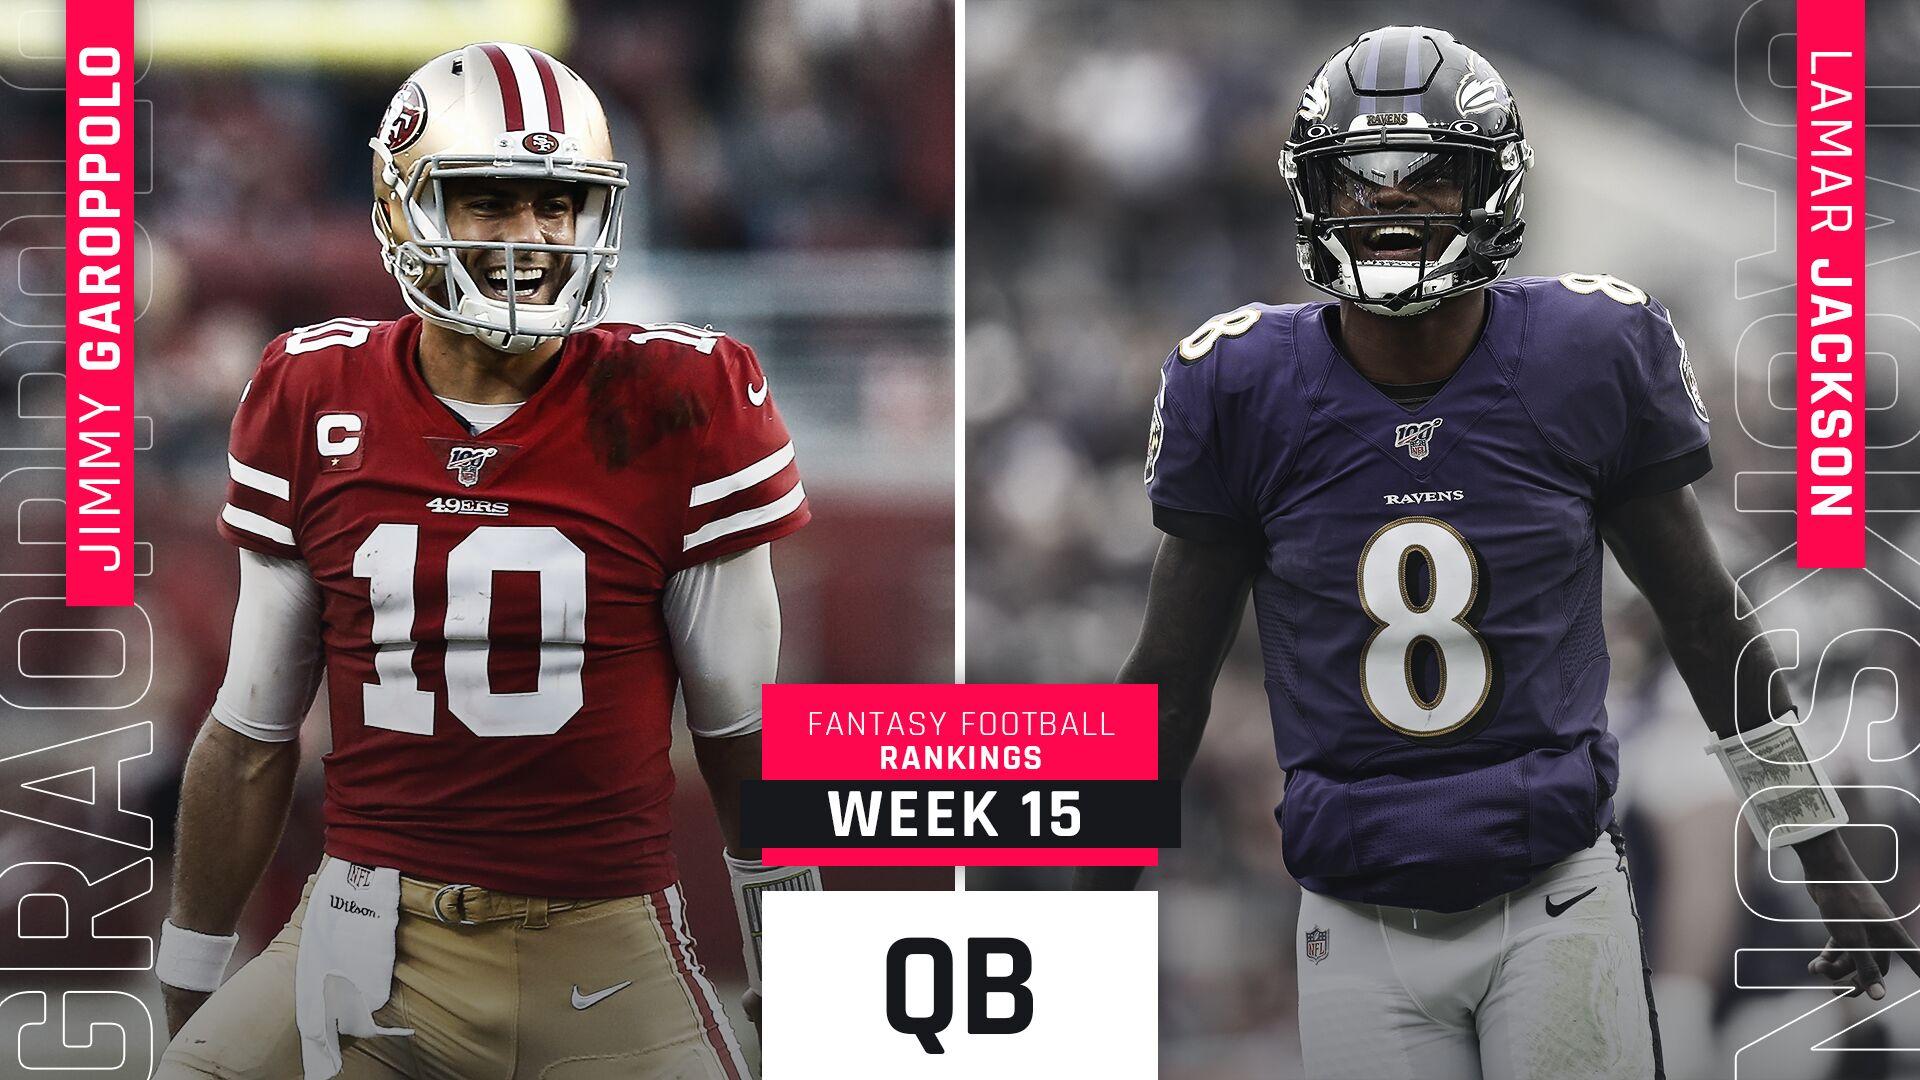 Week 15 Fantasy QB Rankings: Jimmy Garoppolo, Ryan Tannehill on the rise